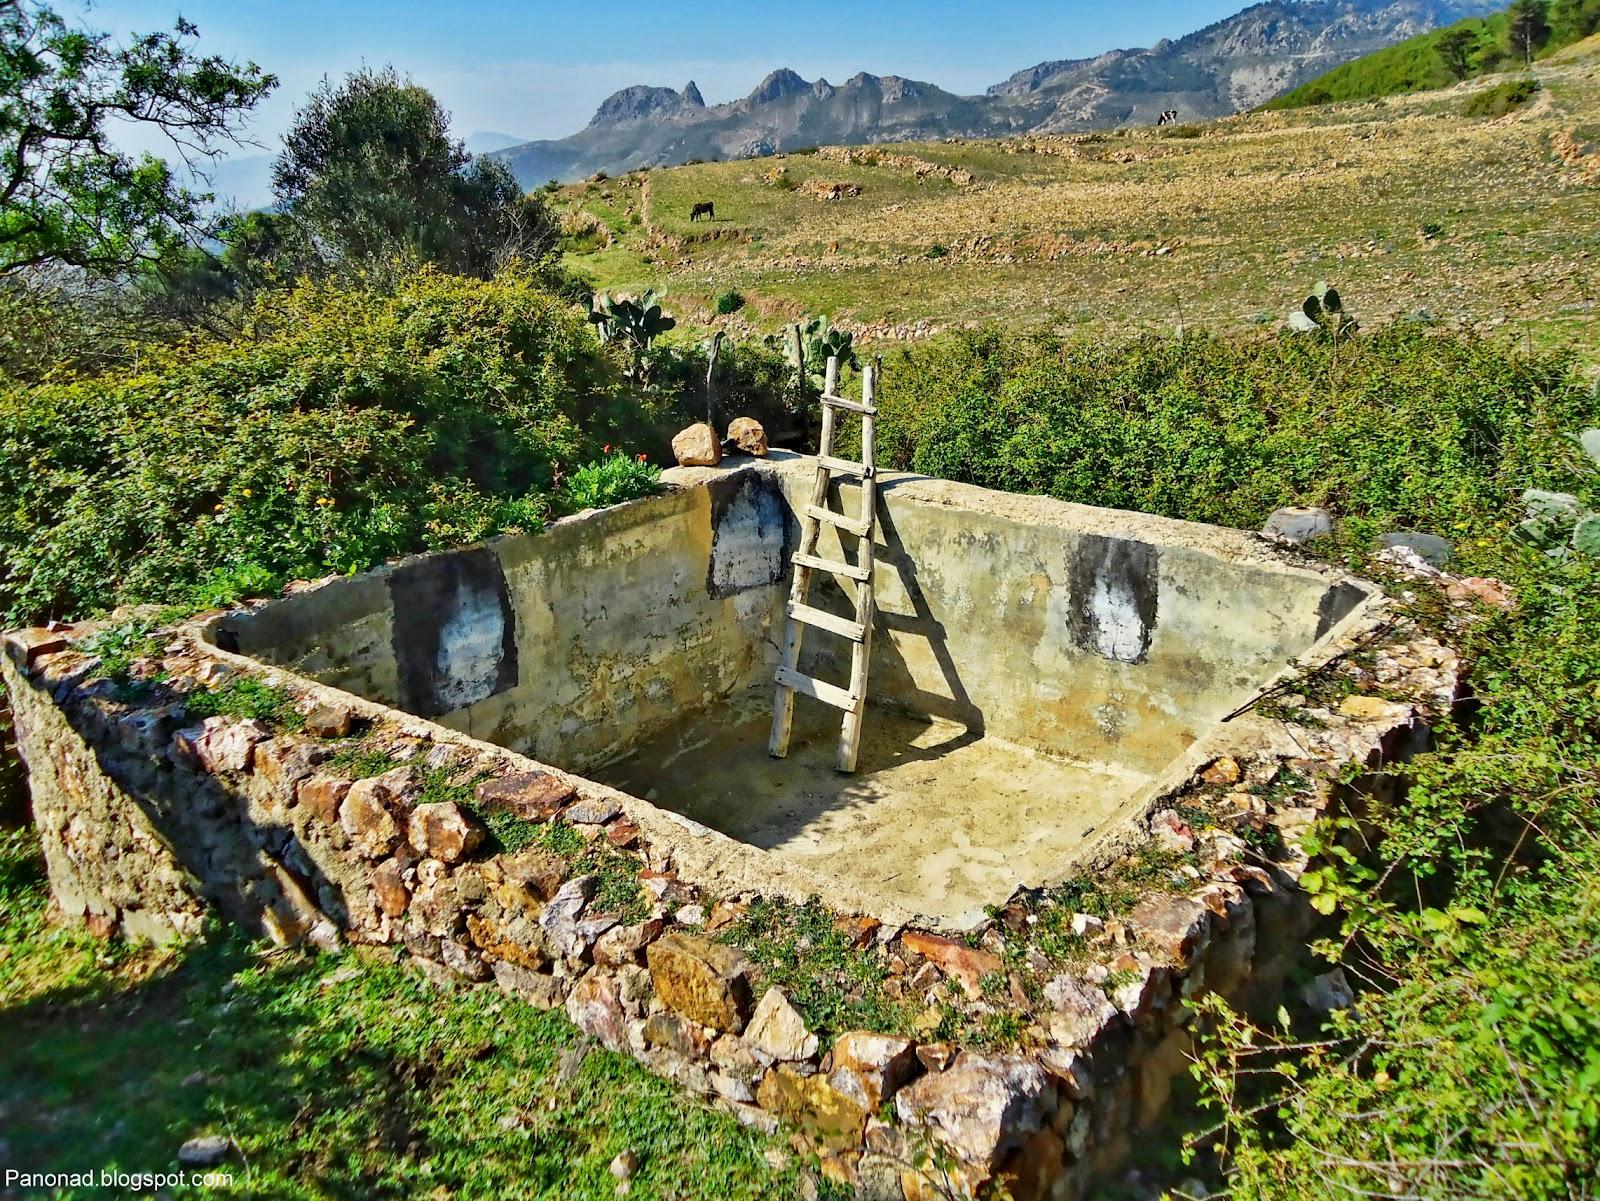 Panorama de Nador بانوراما الناظور: Des vues imprenables